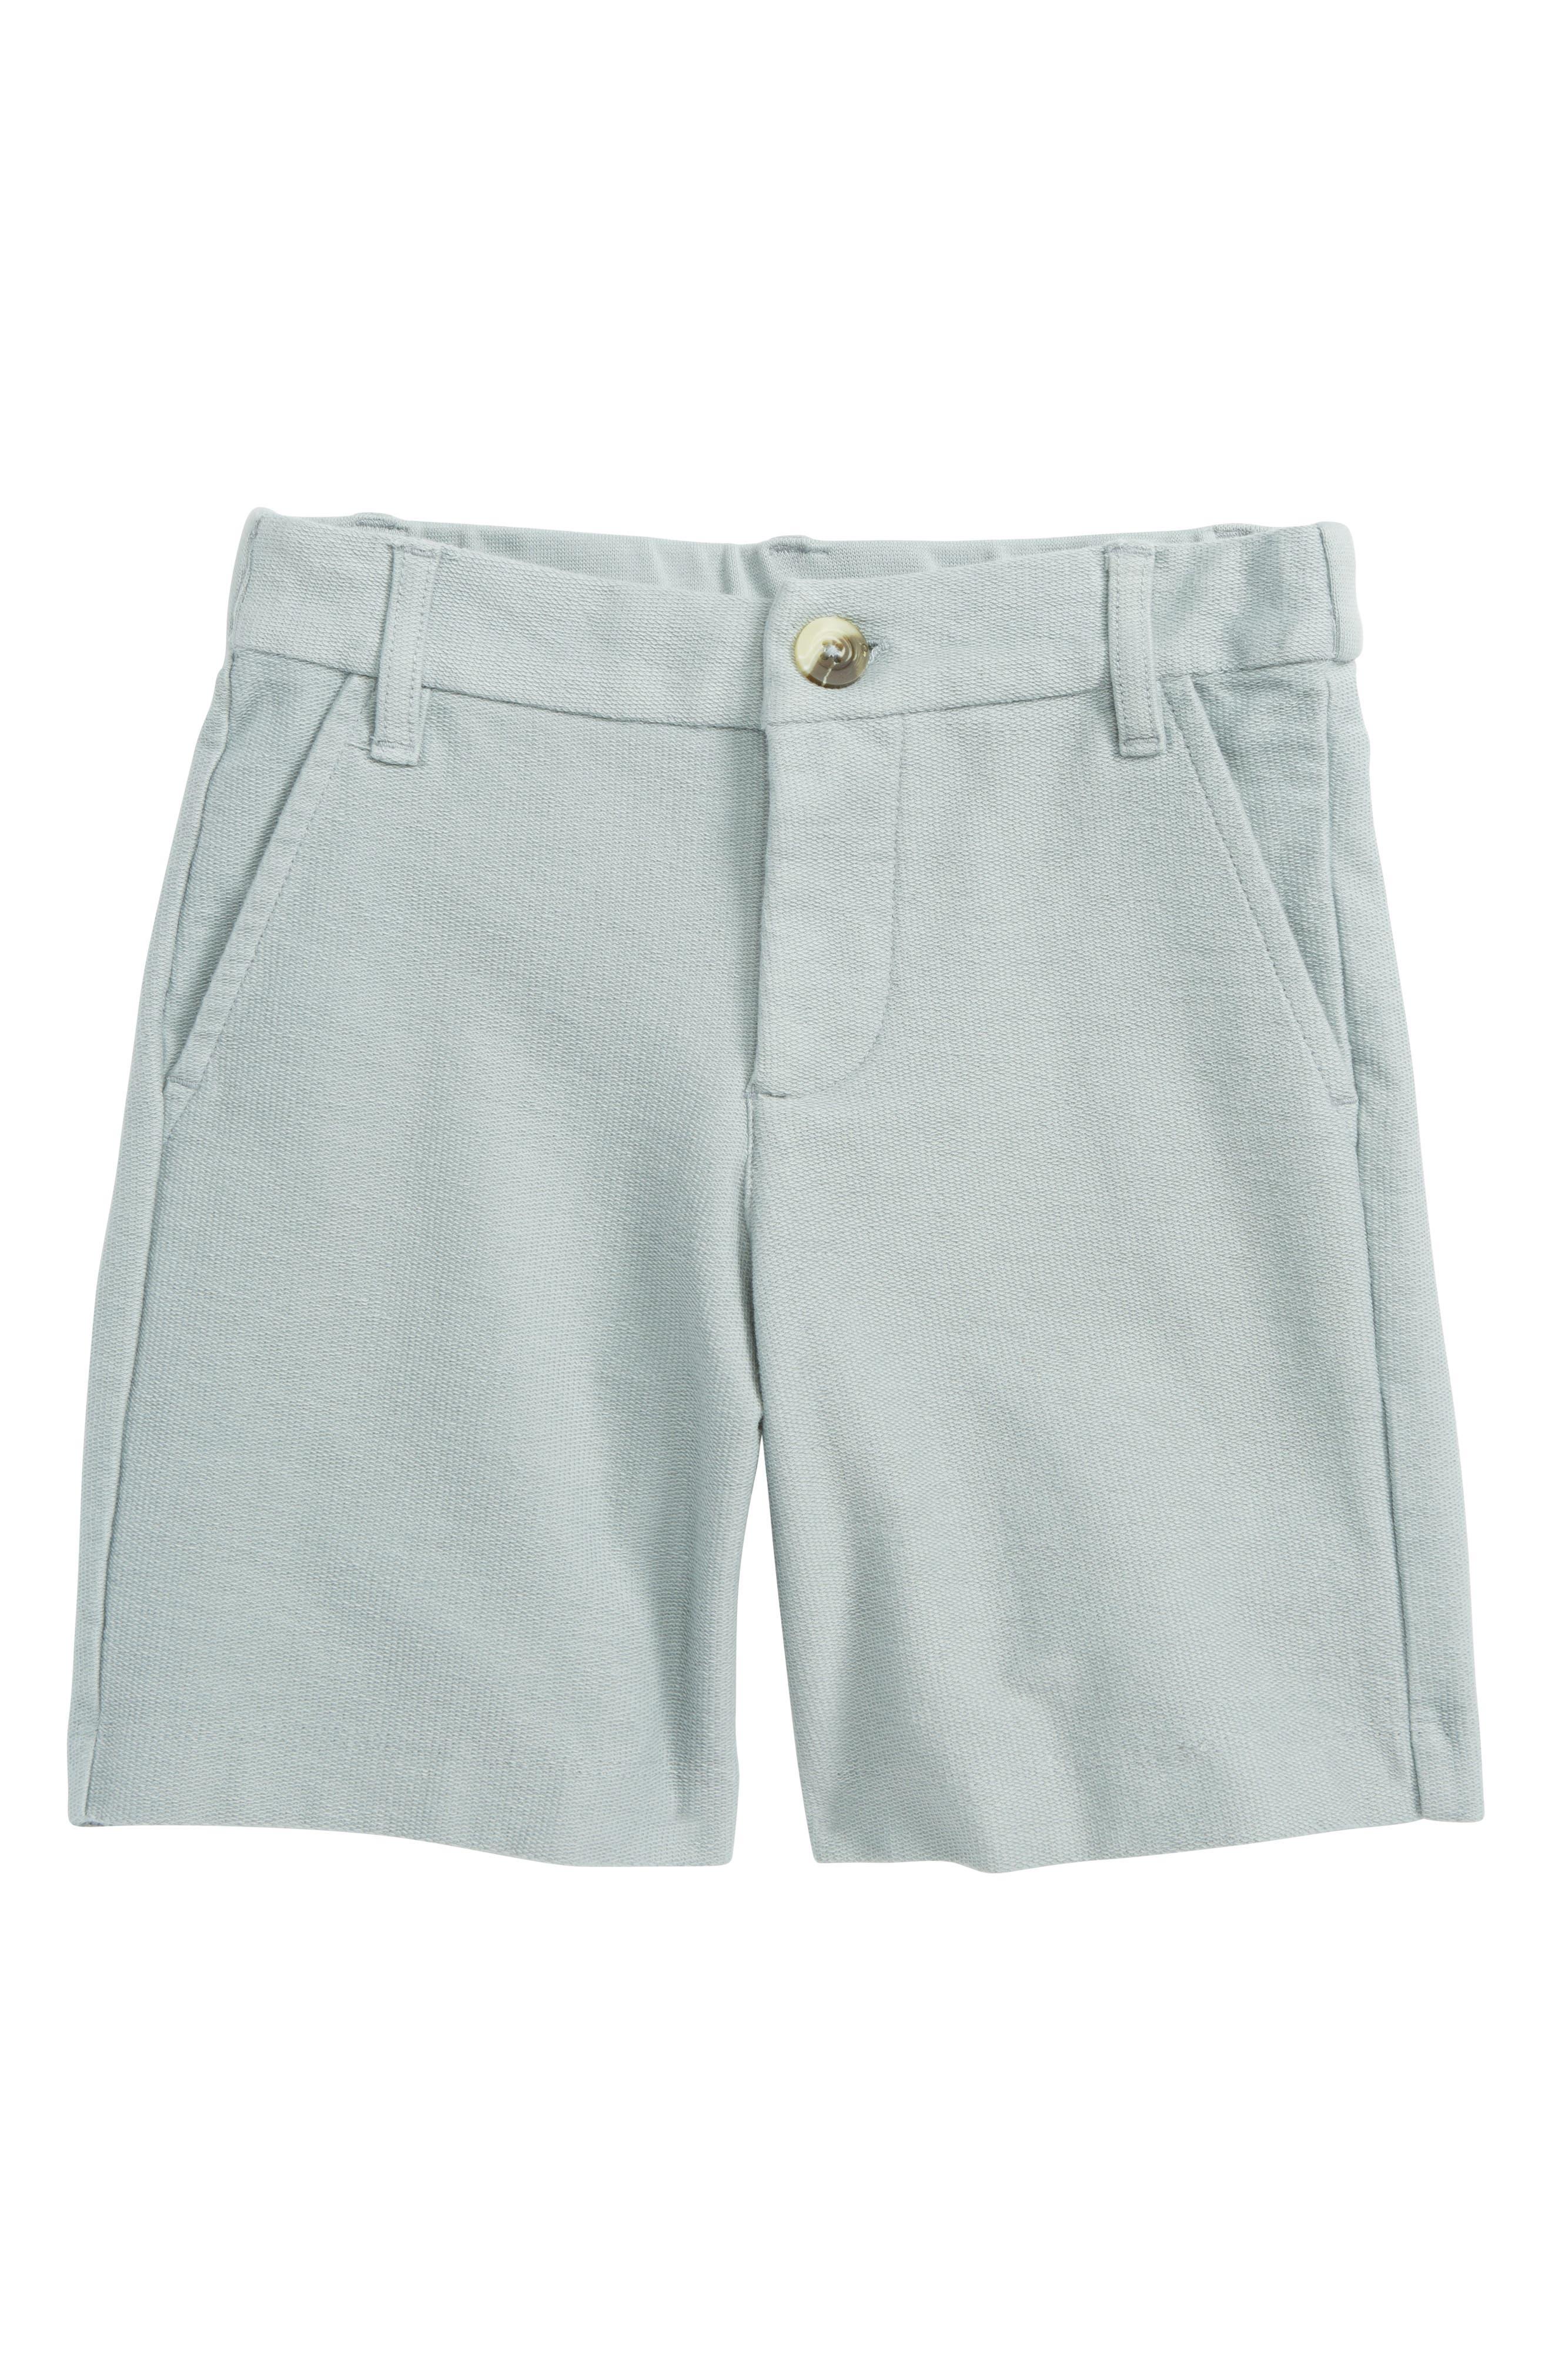 Easton Shorts,                             Main thumbnail 1, color,                             322